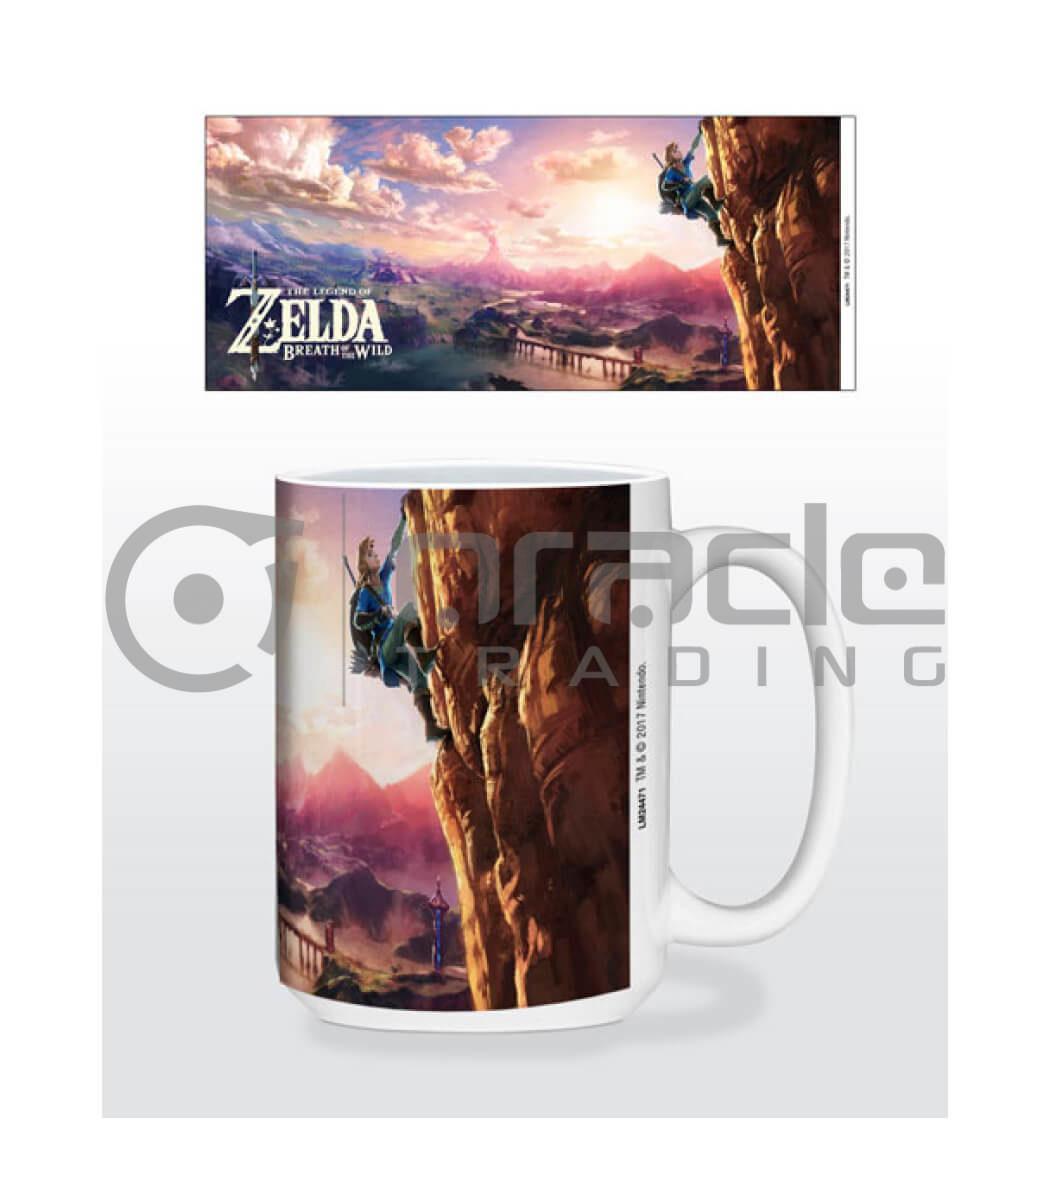 Zelda Mug - The Climb